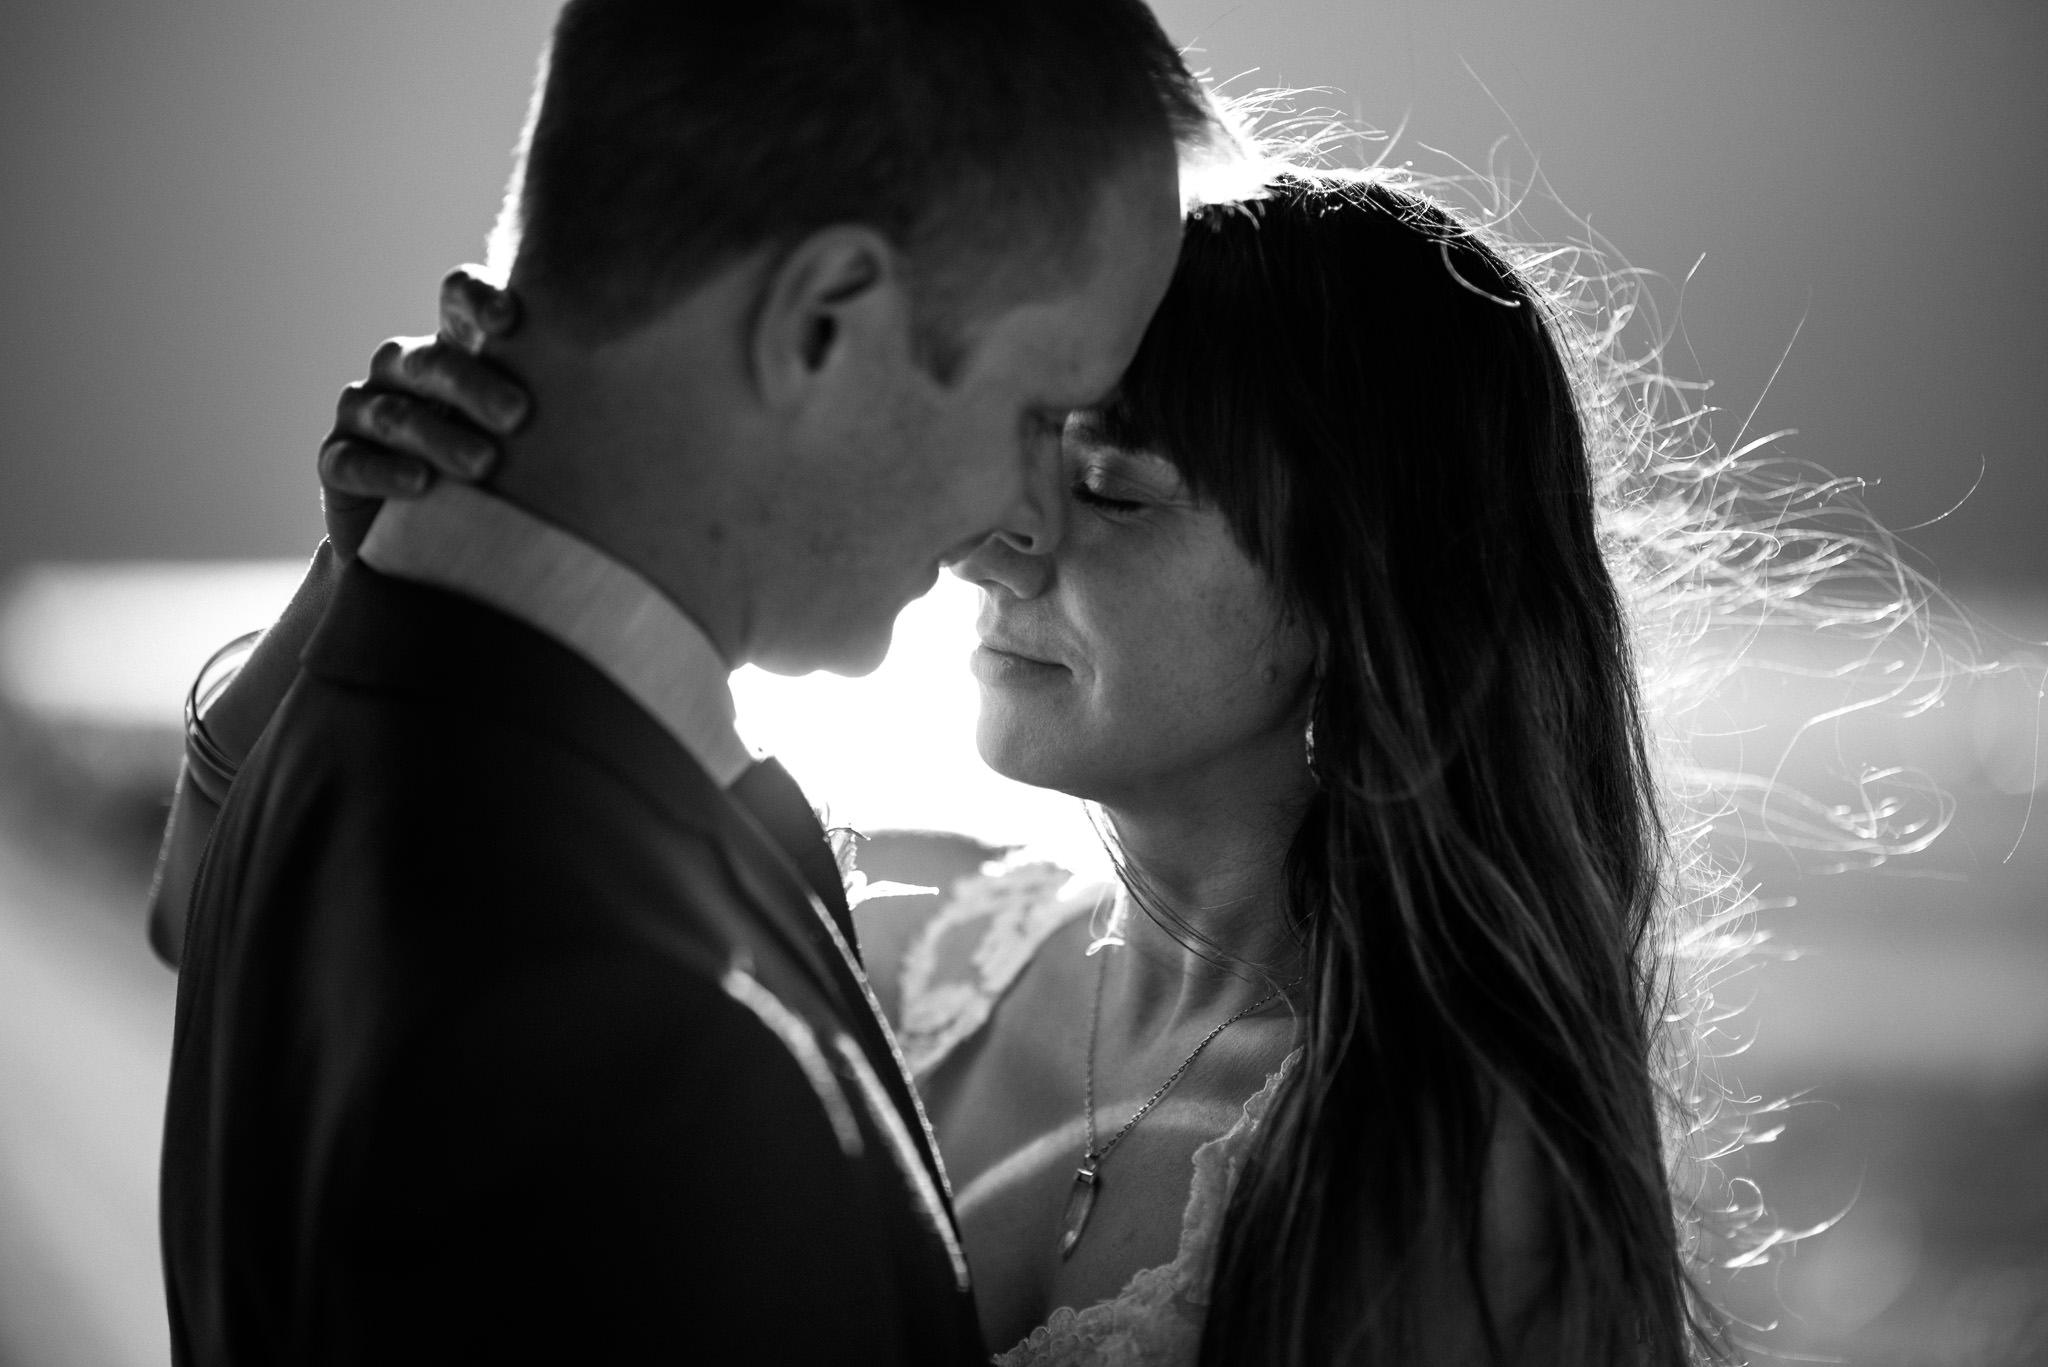 Melanie-Matt-Pitt-Lake-Post-Wedding-Shoot-Victoria-Wedding-Photographers-11.jpg